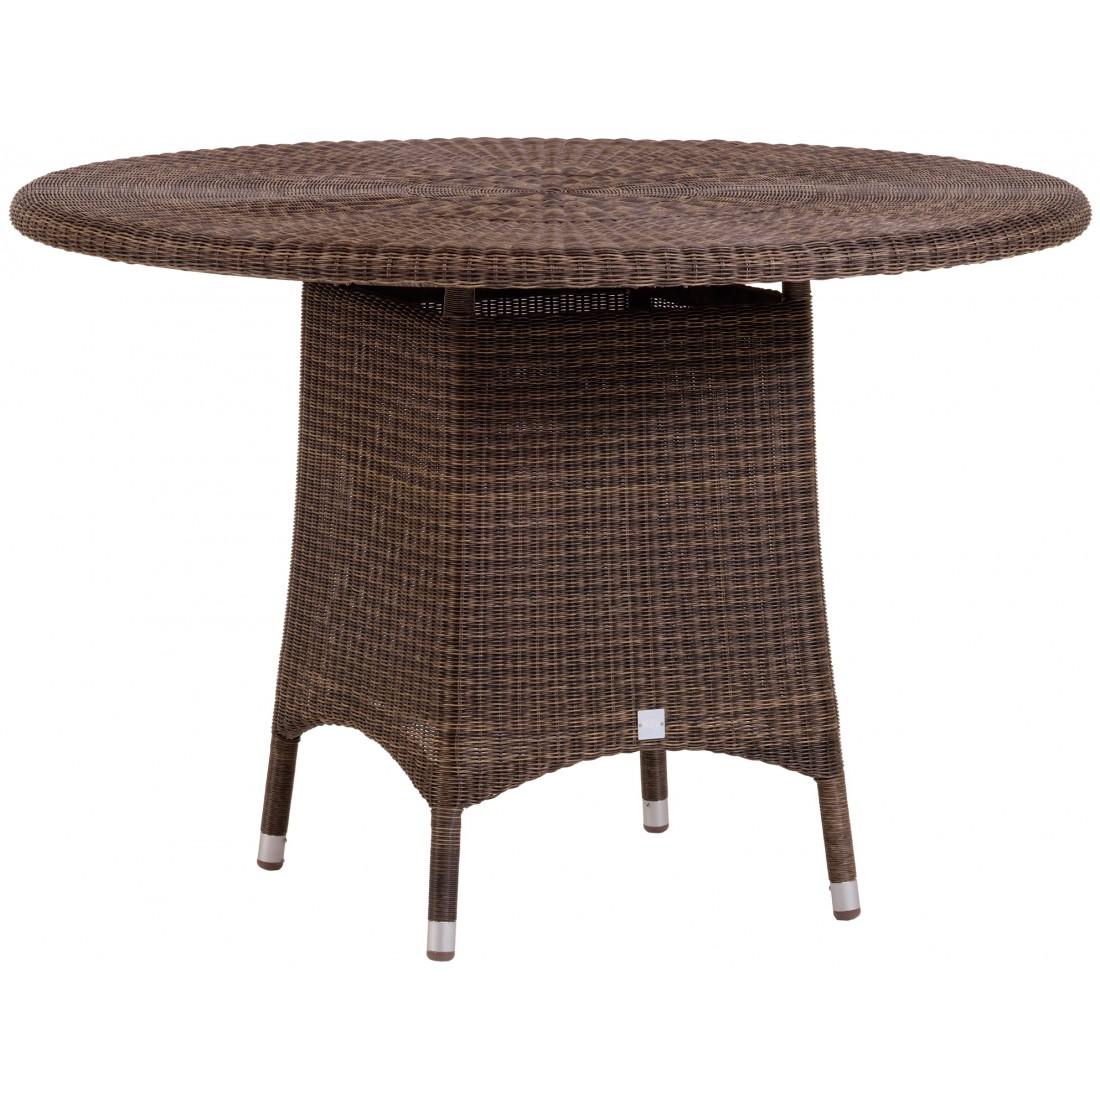 cigale outdoor 110cm table in poivre resin. Black Bedroom Furniture Sets. Home Design Ideas